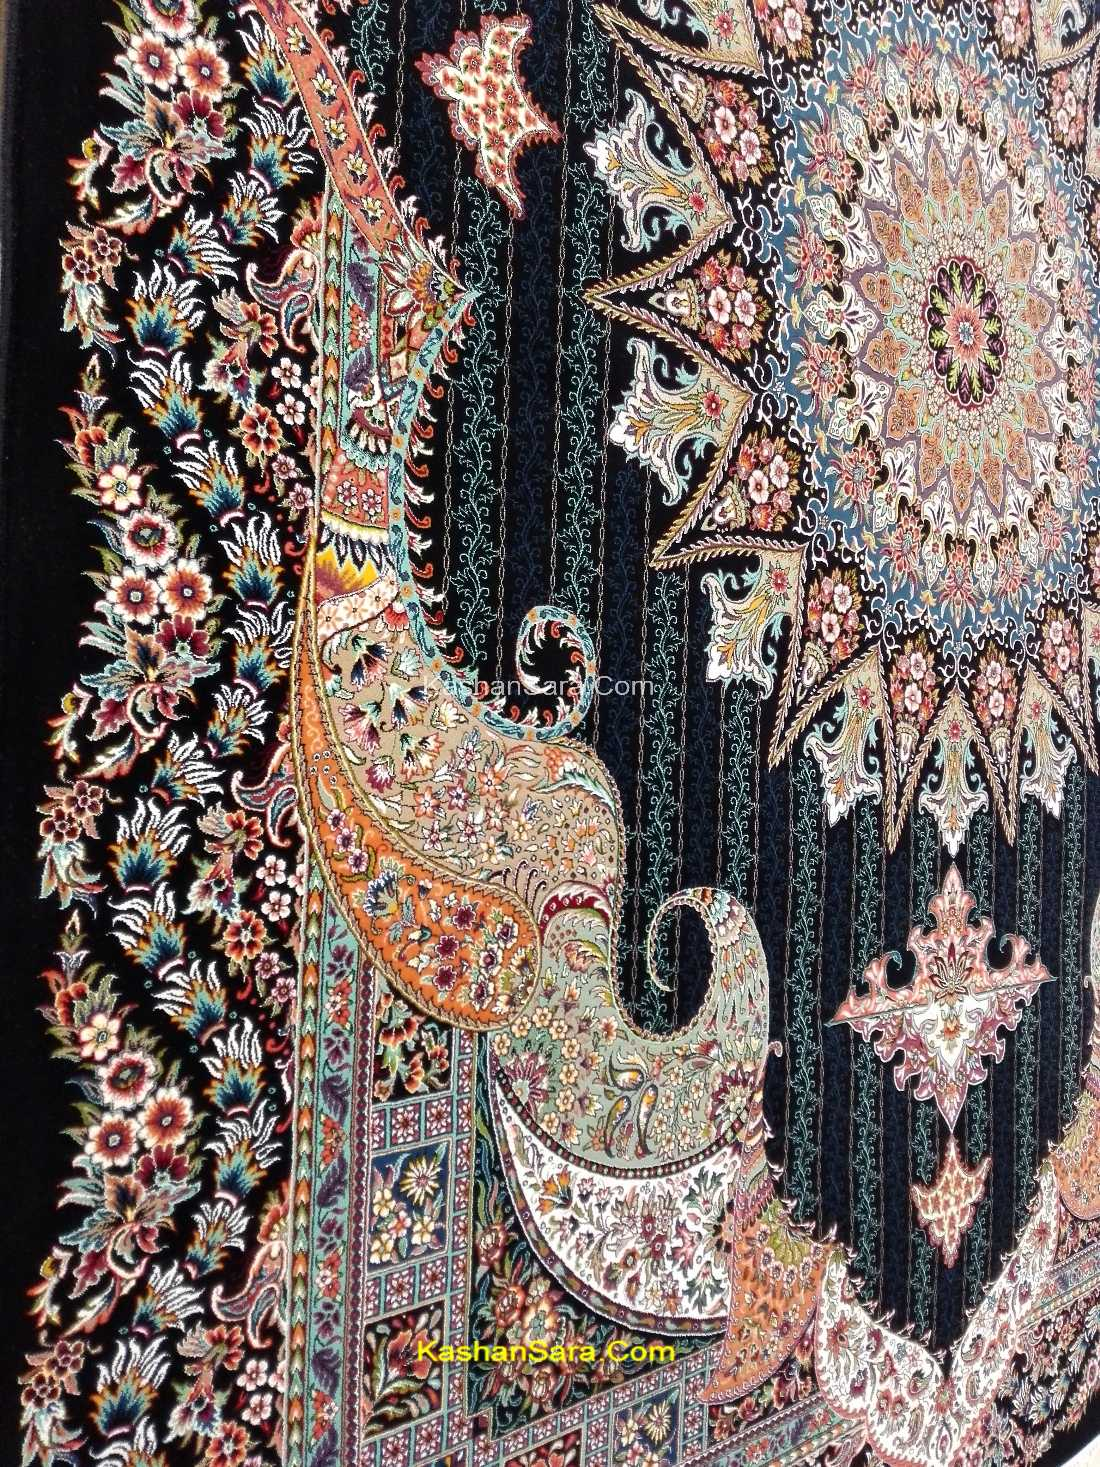 فرش ماشینی ۷۰۰ شانه طرح اساطیر